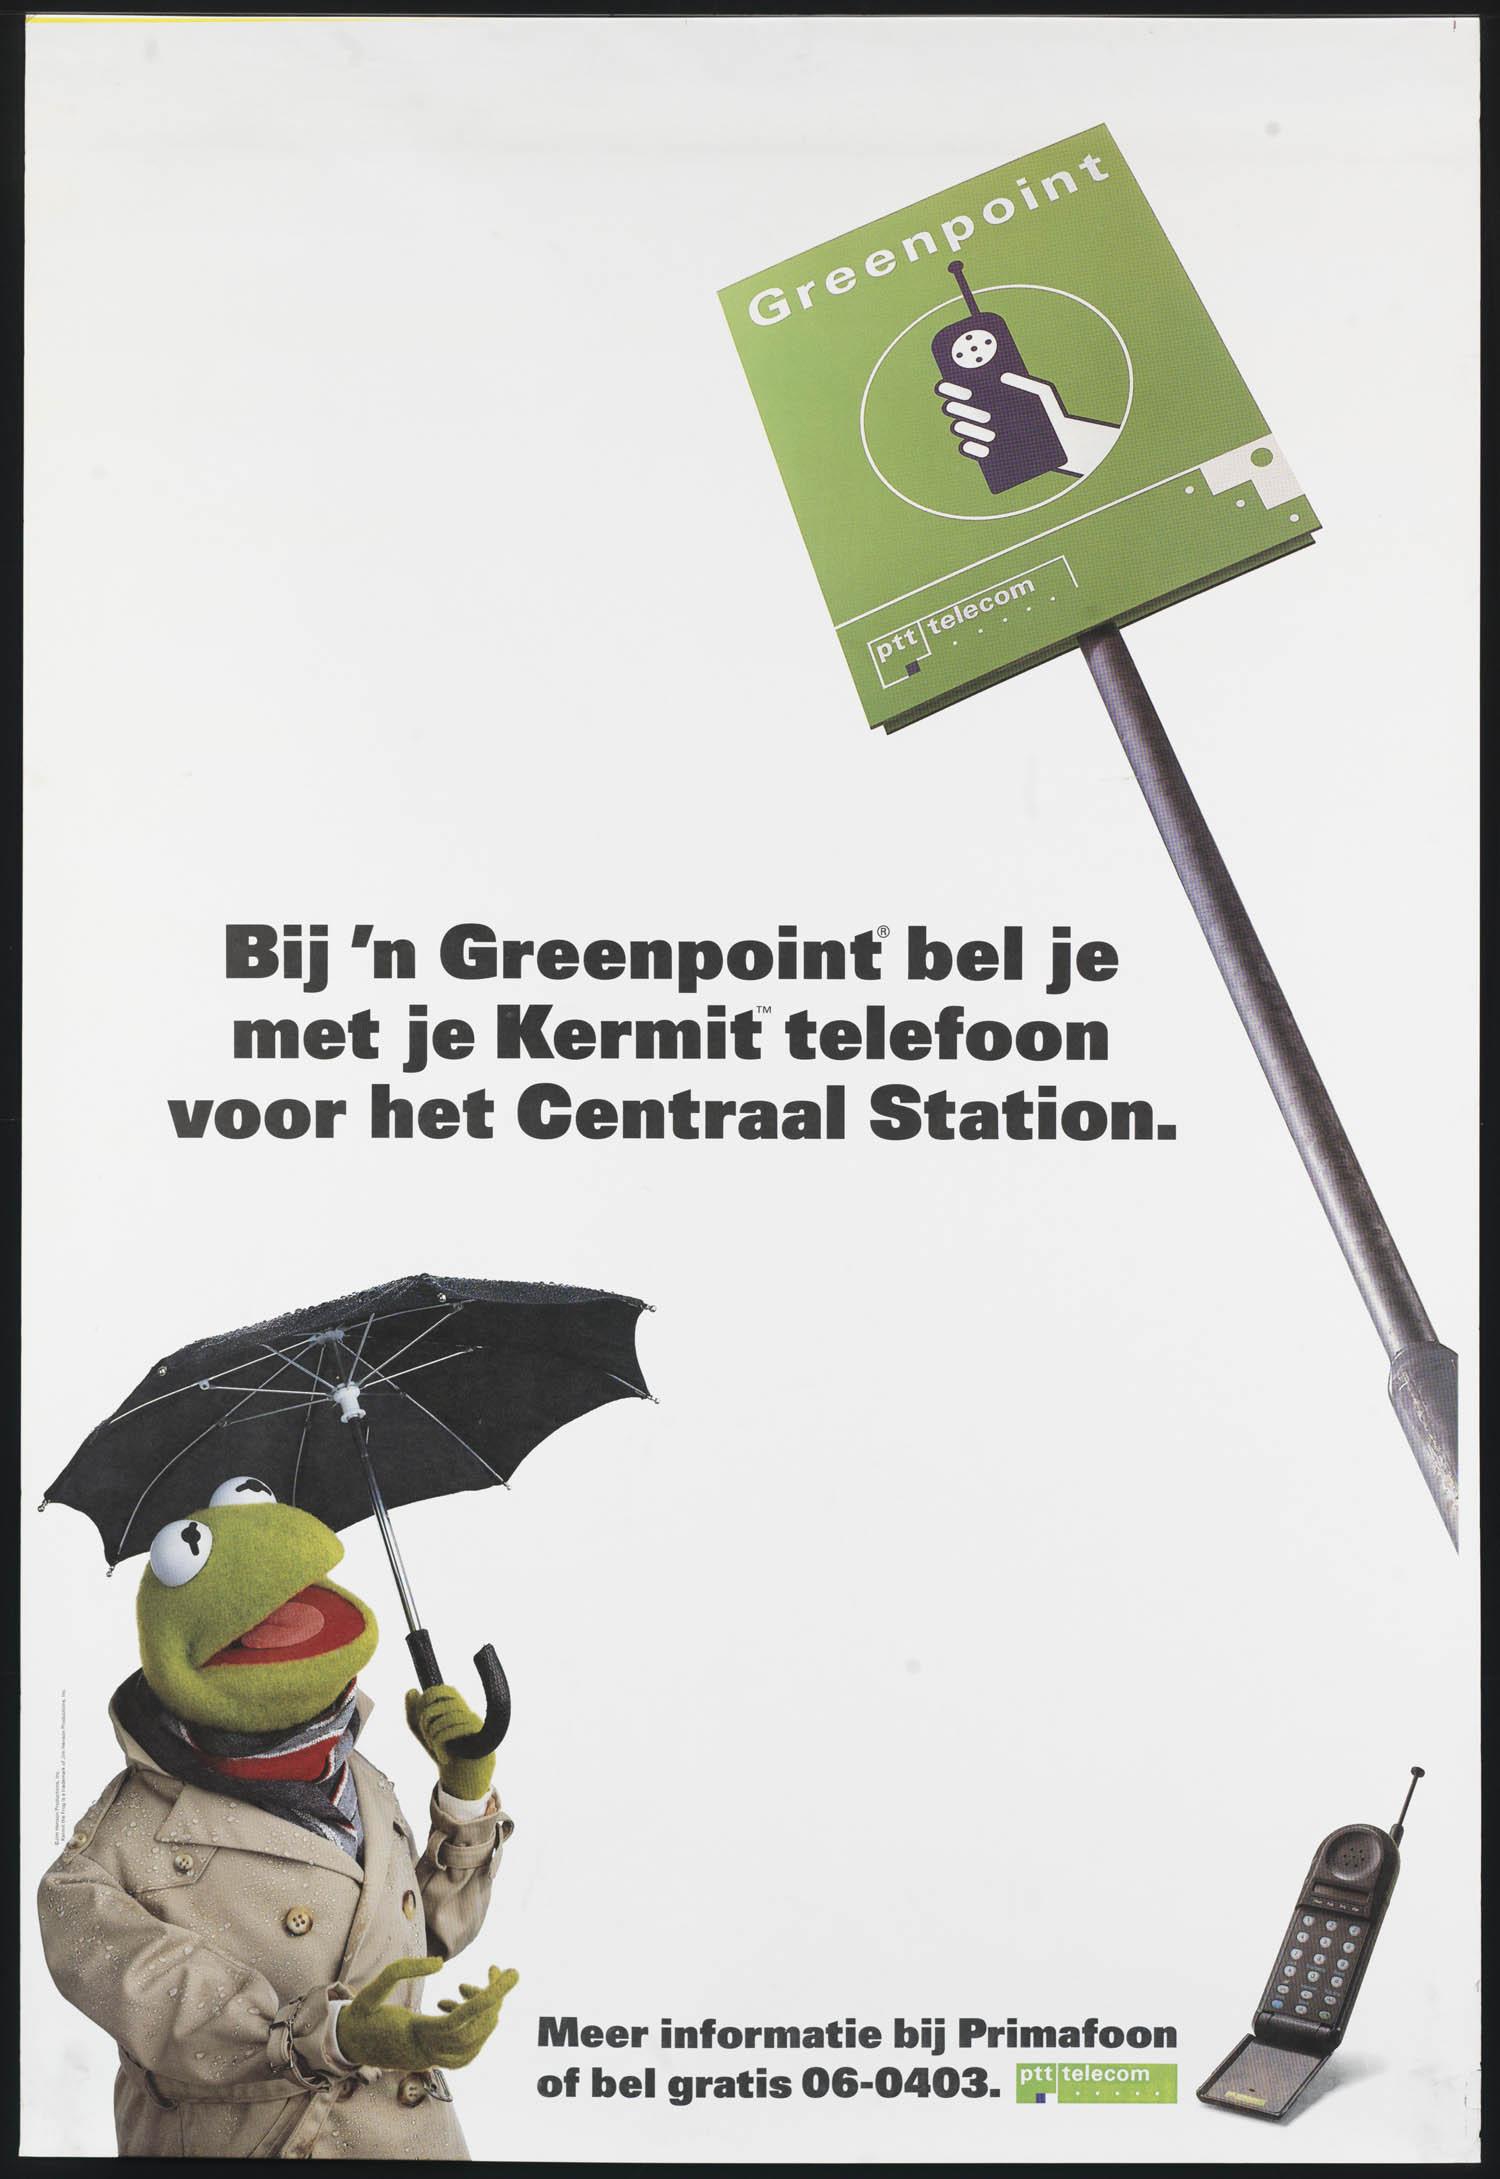 Kermit, greenpoint